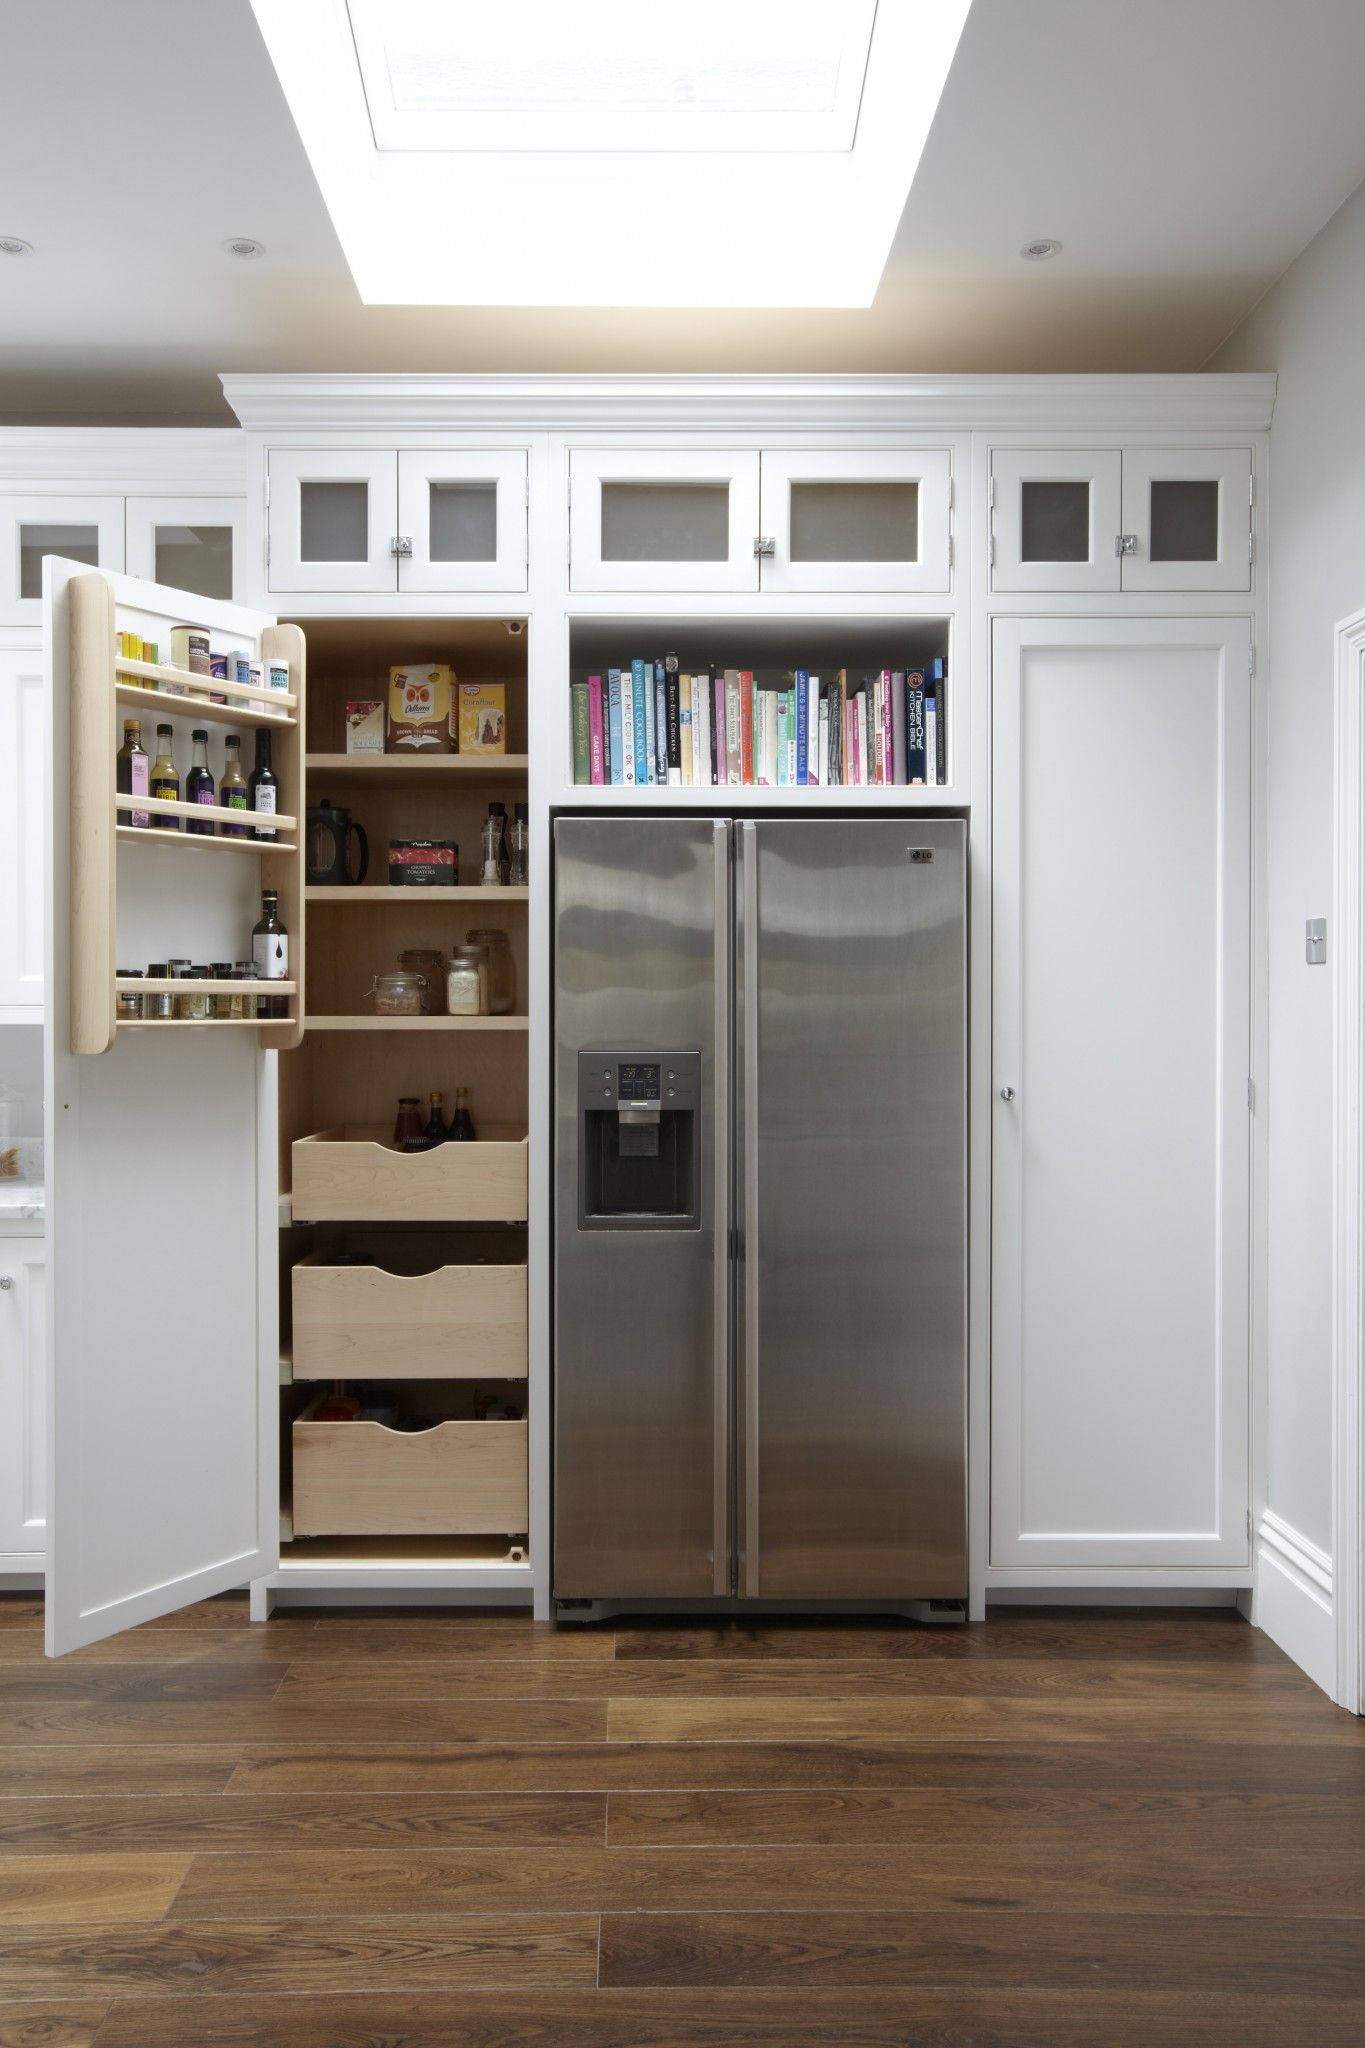 American style kitchen - Hampton American Style Kitchen